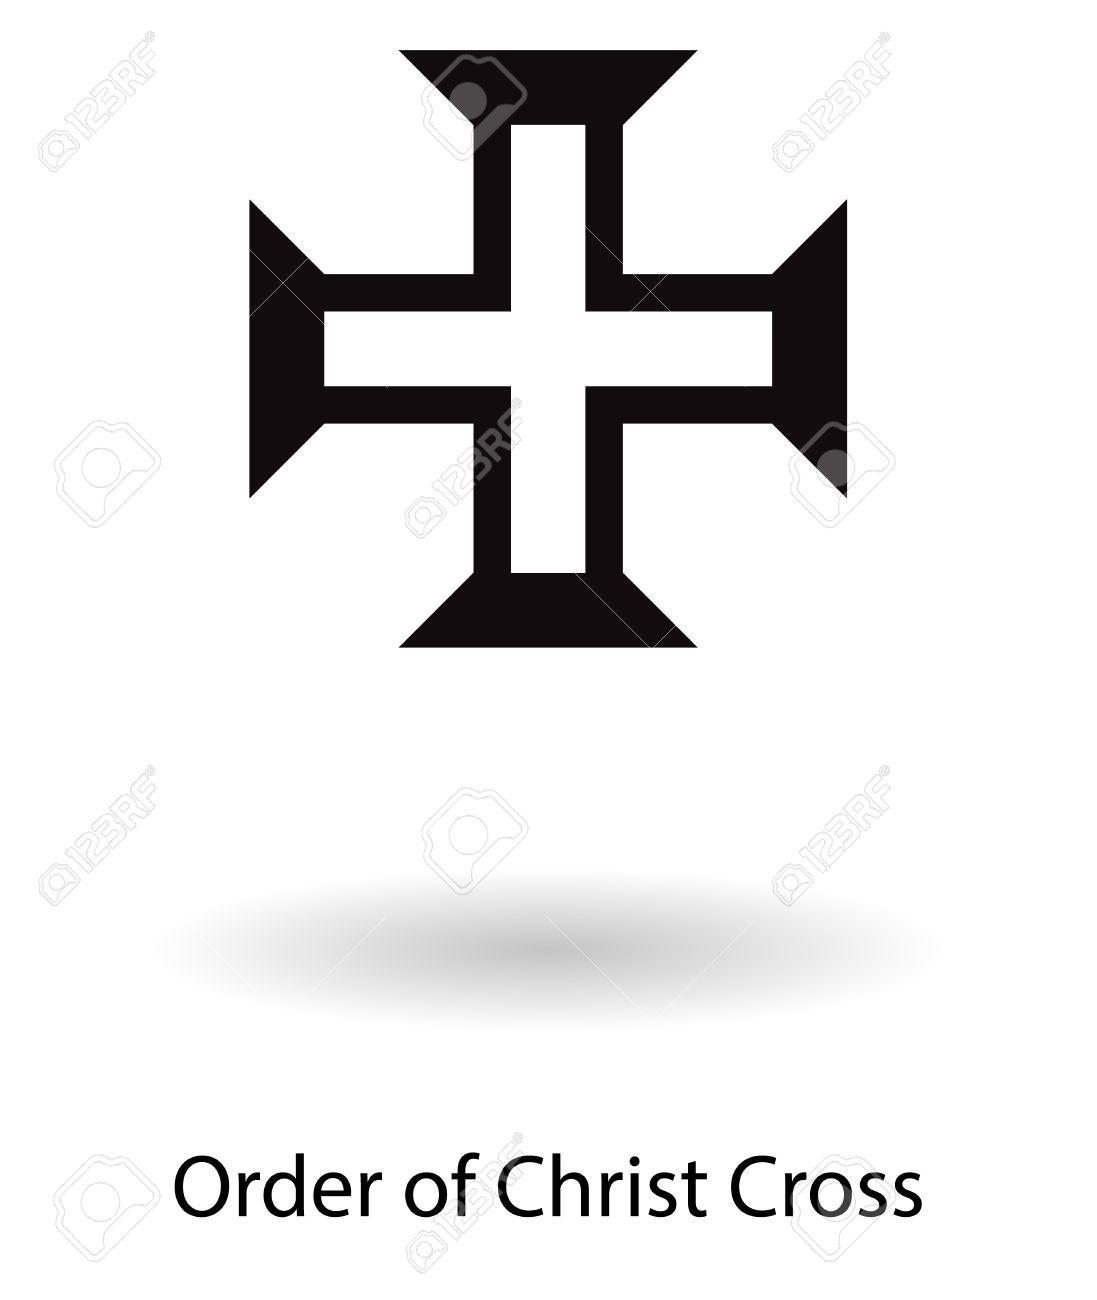 Order of christ cross symbol vector silhouette isolated over order of christ cross symbol vector silhouette isolated over white background stock vector 46720530 biocorpaavc